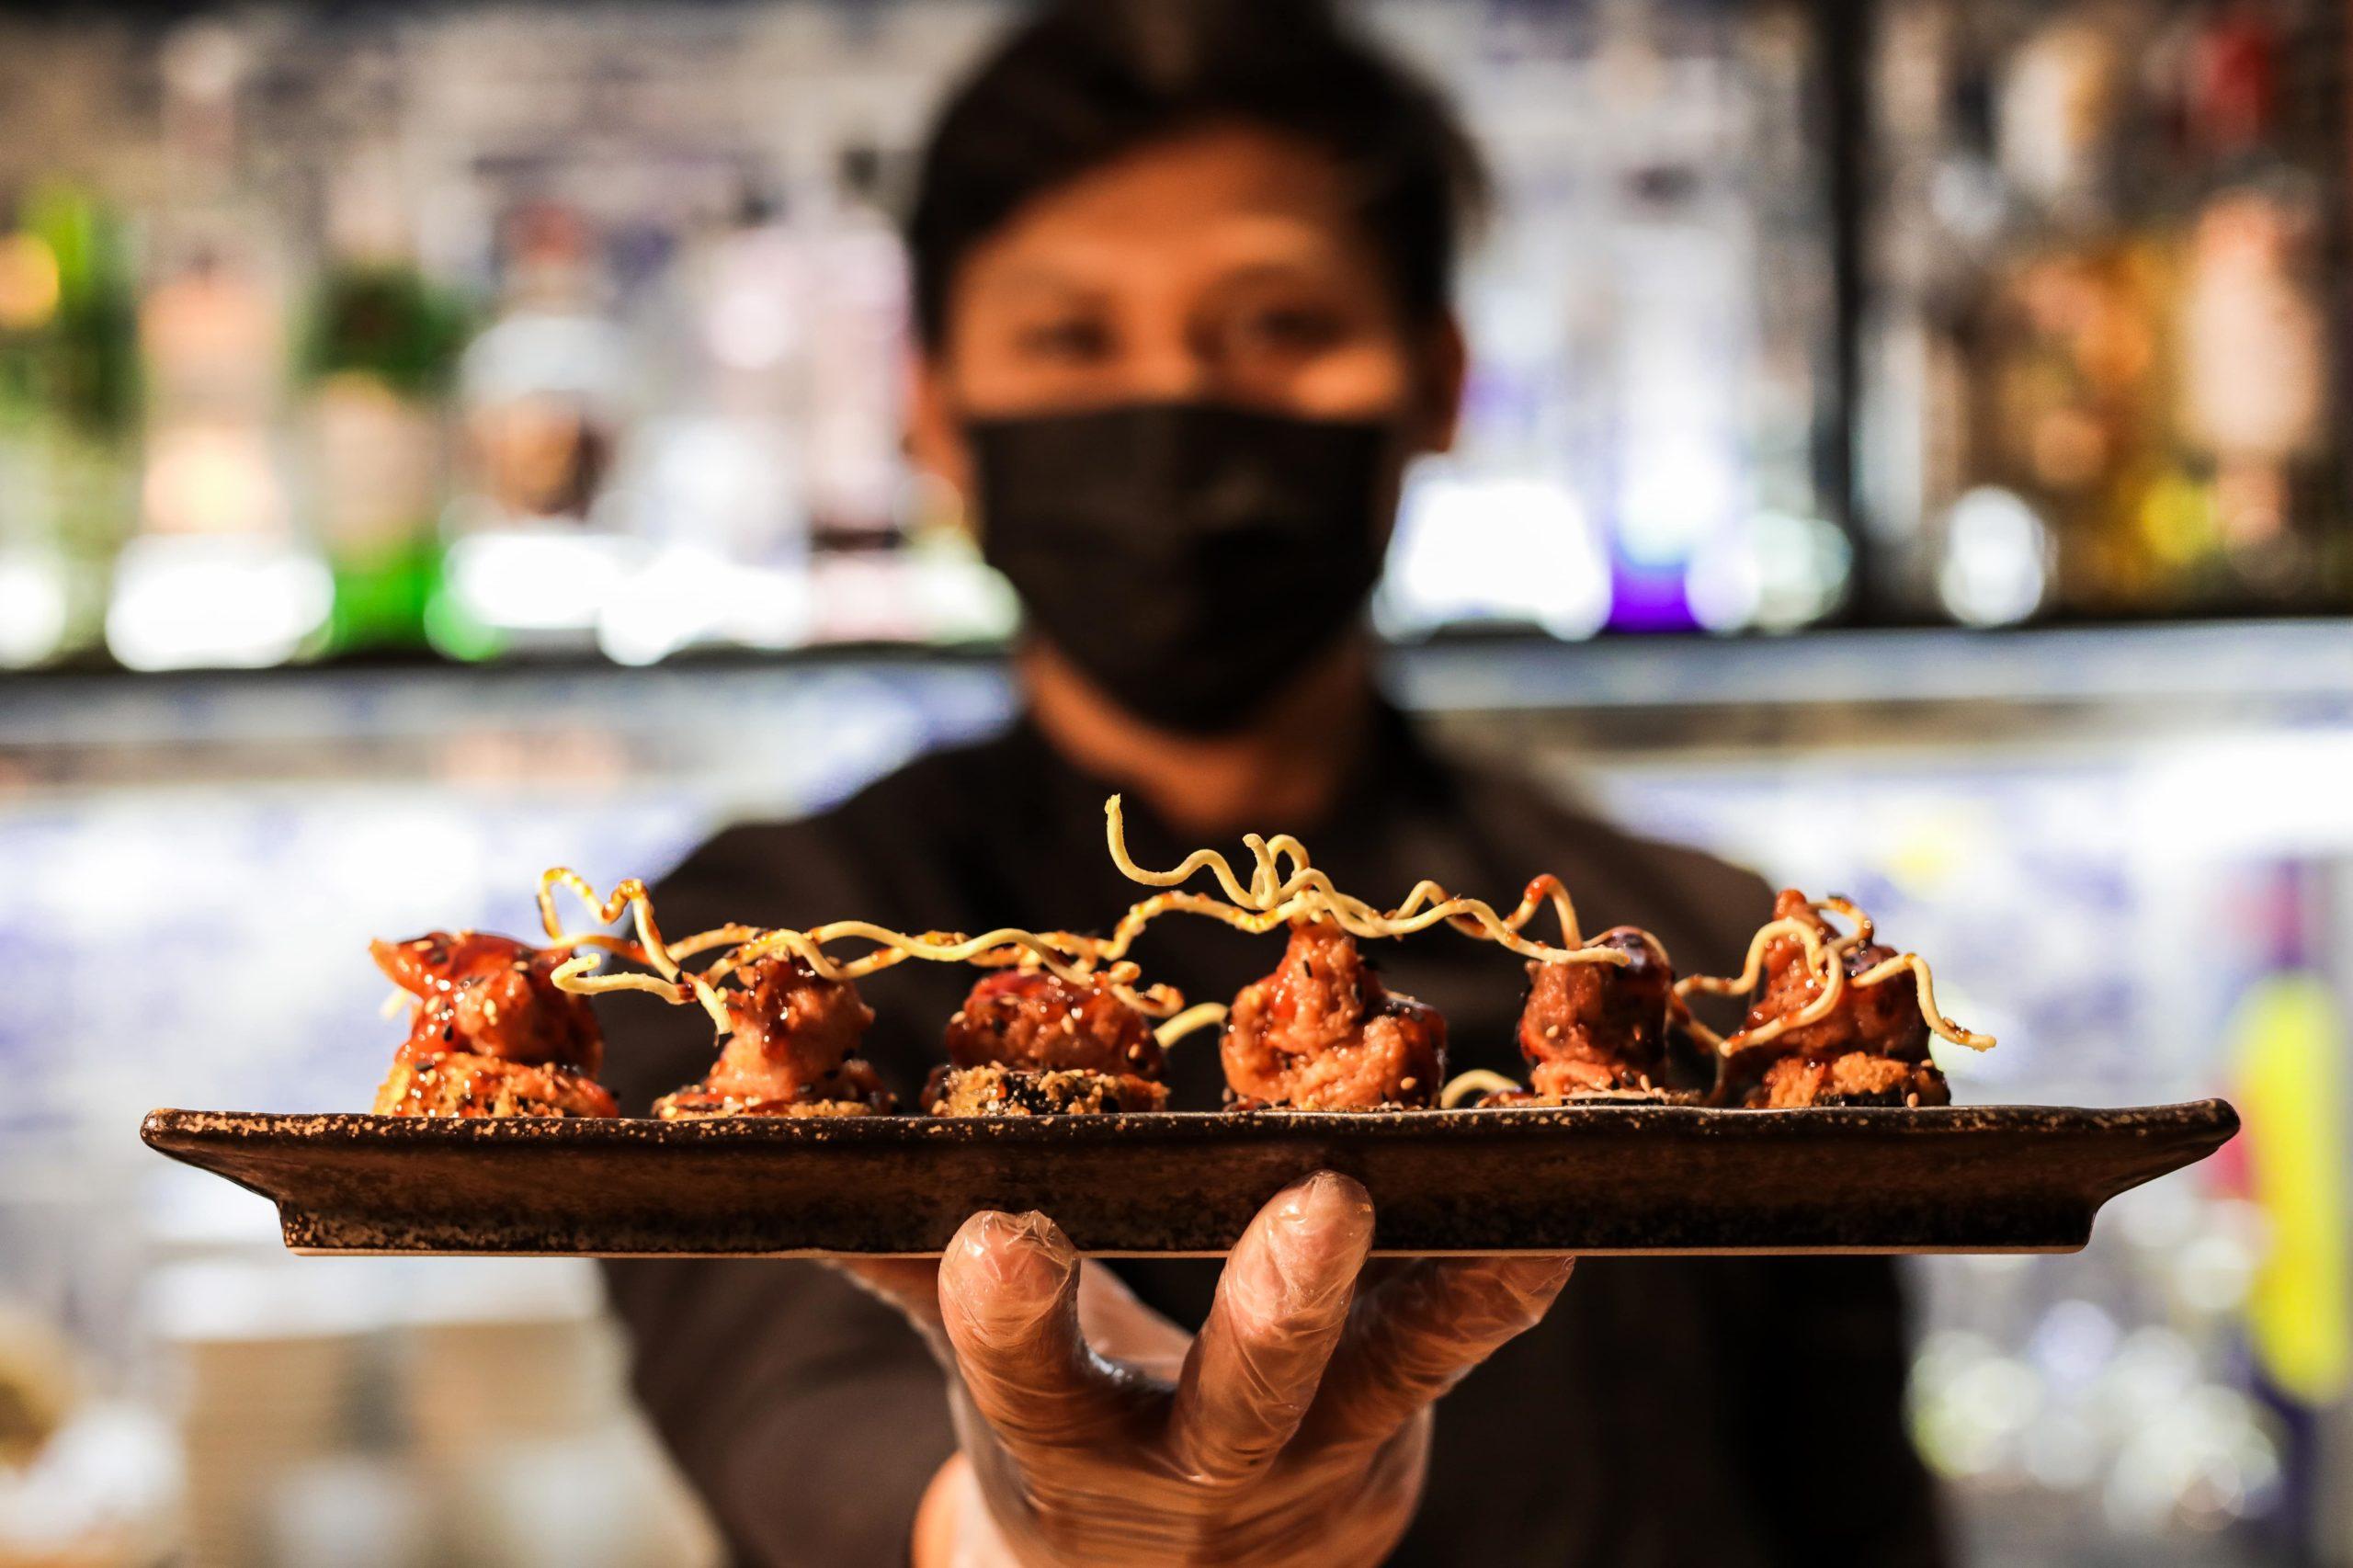 Donde comer sushi en platja d'aro - mejor sushi restaurant en girona - best places to eat sushi in the costa brava 6